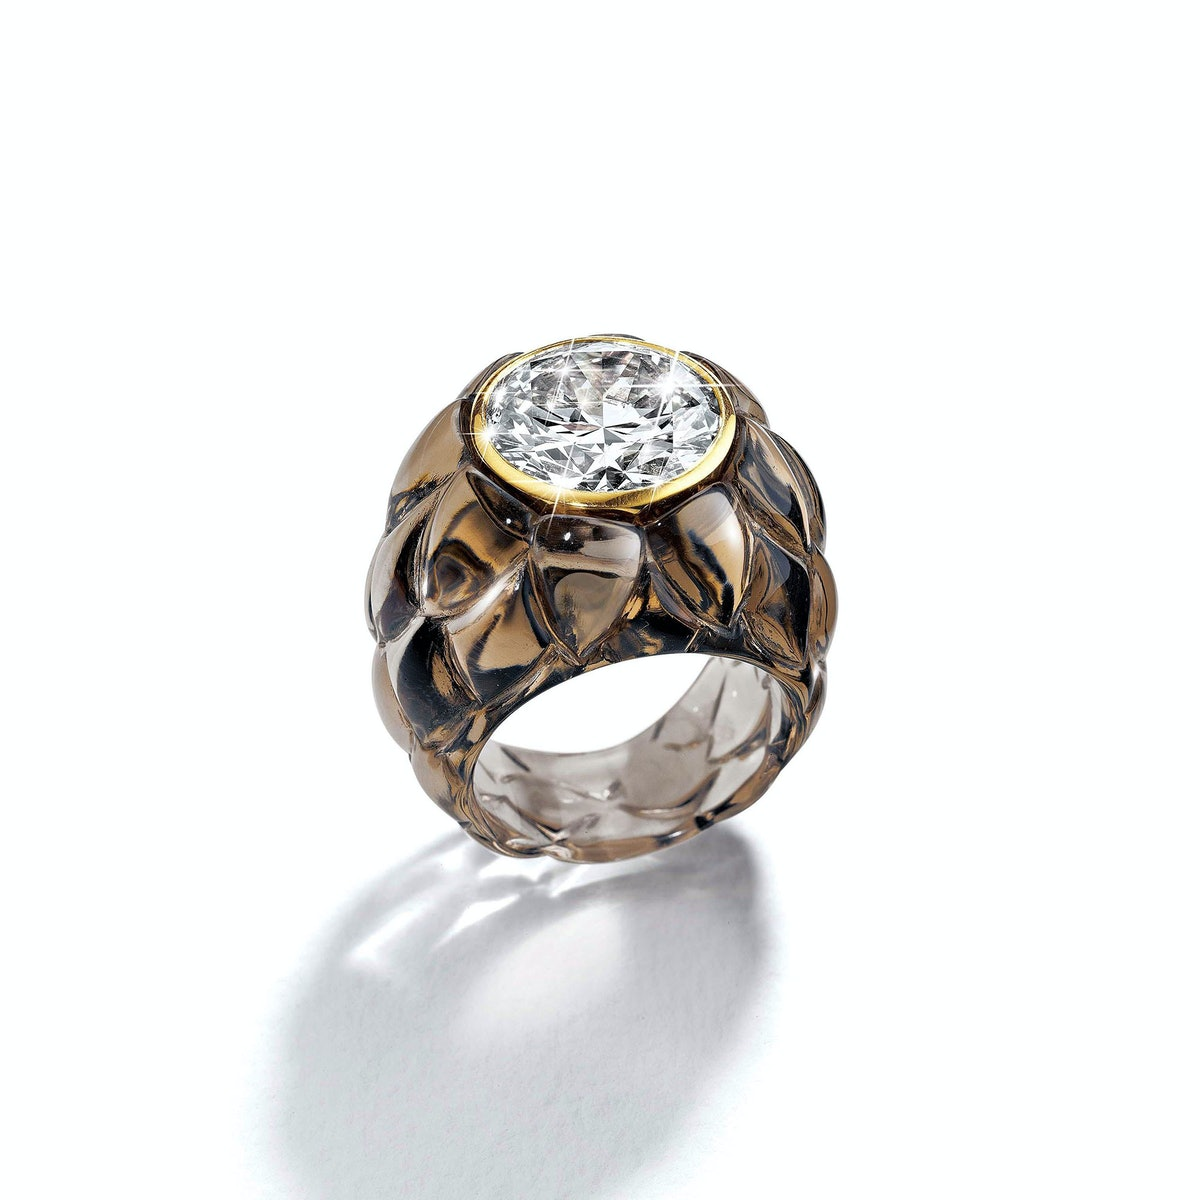 Belperron-7.34-Carat-Diamond-and-Carved-Smoky-Quartz-Artichoke-Rings,-Price-Upon-Request,-at-Belperron.com